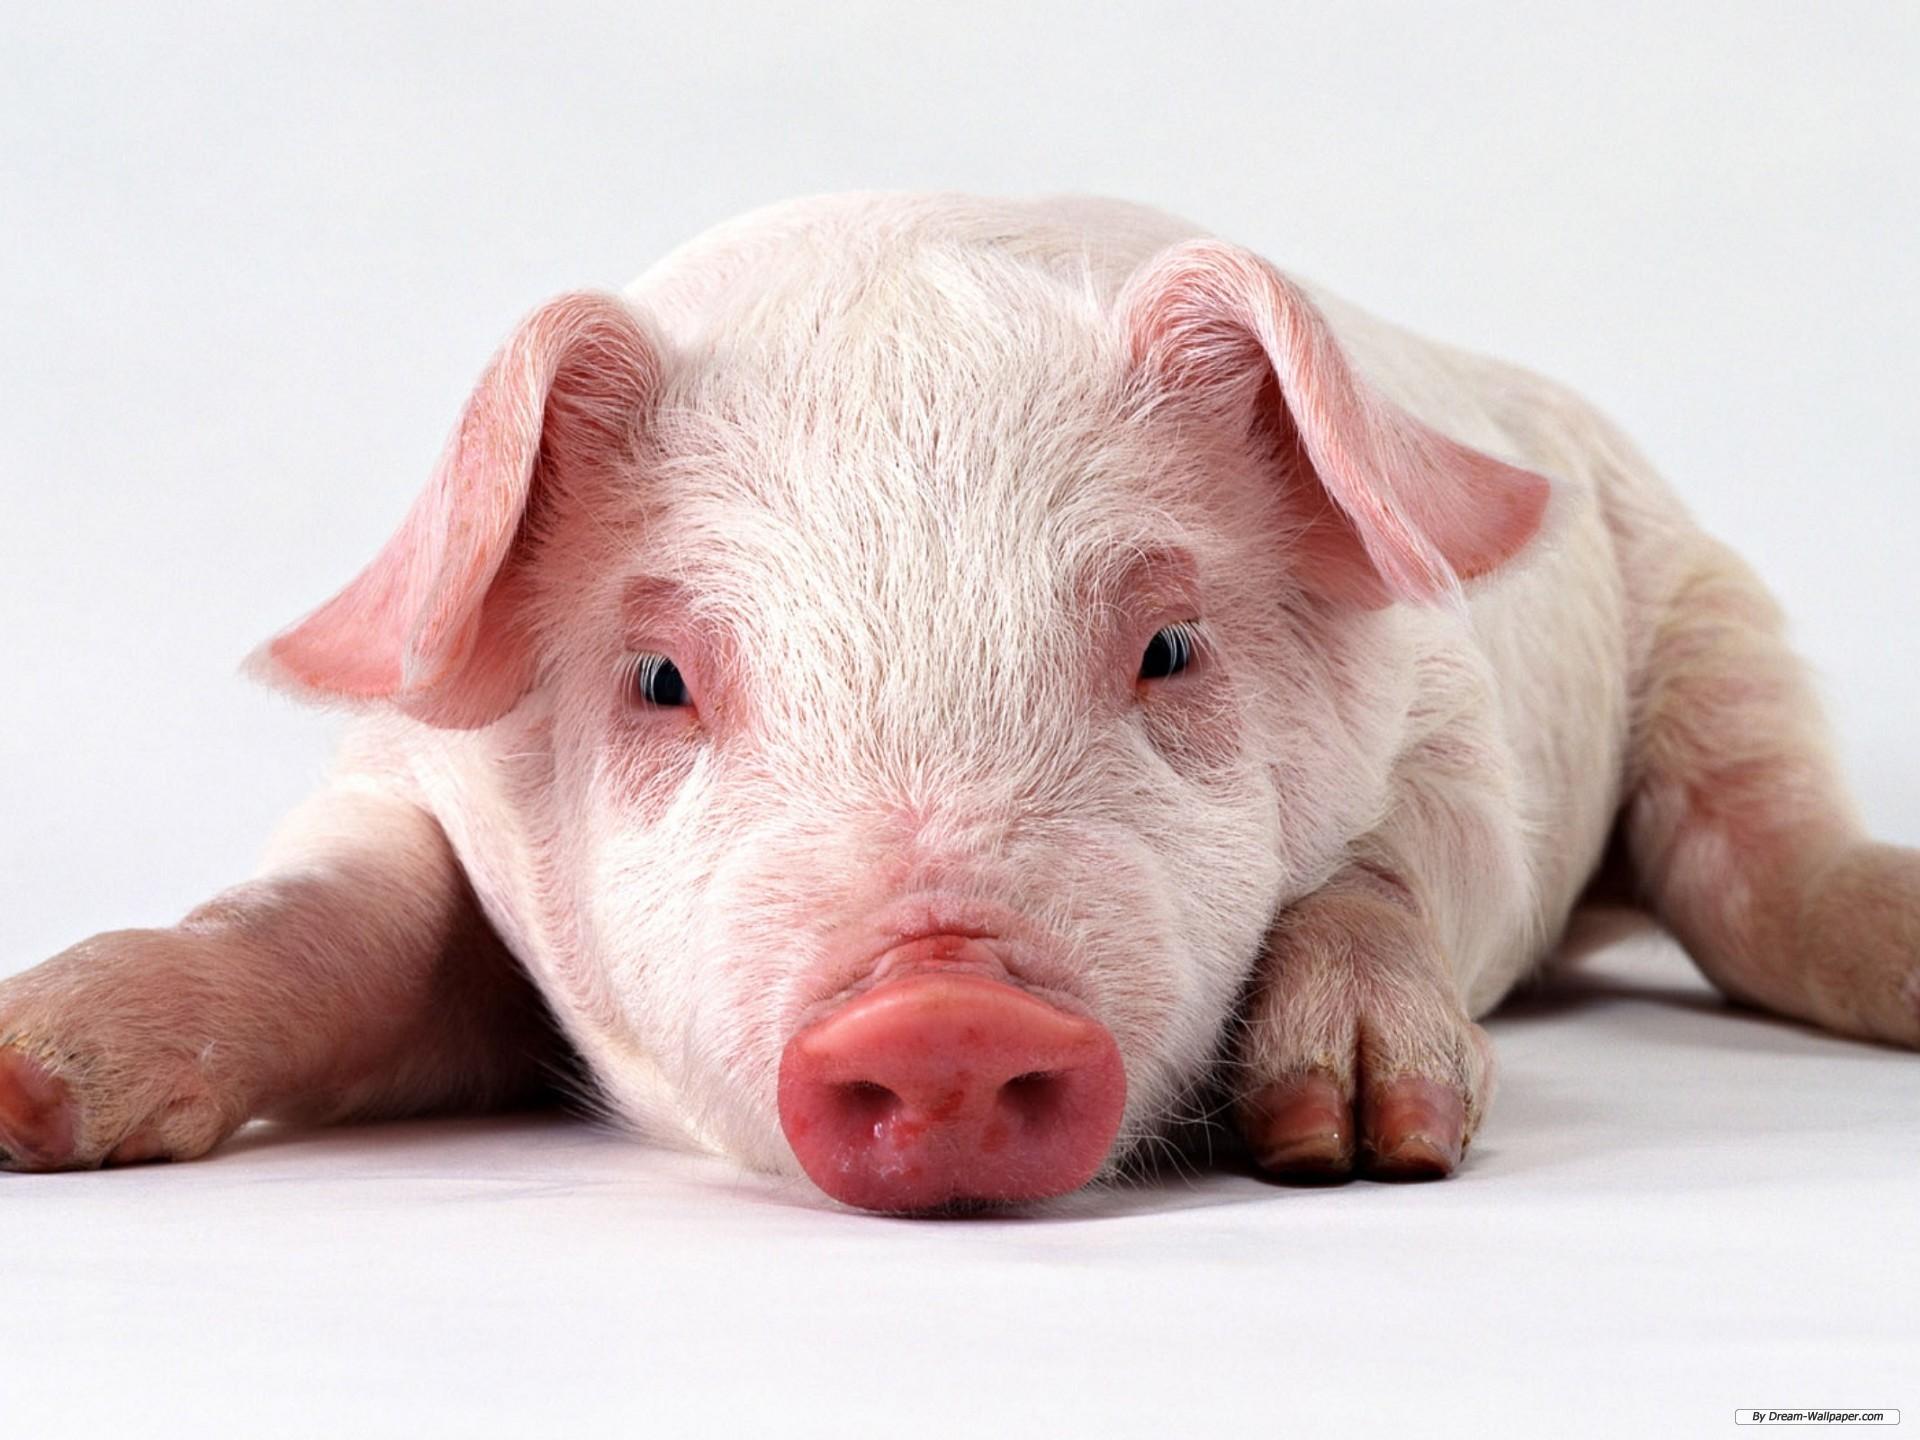 pig wallpaper 62 images